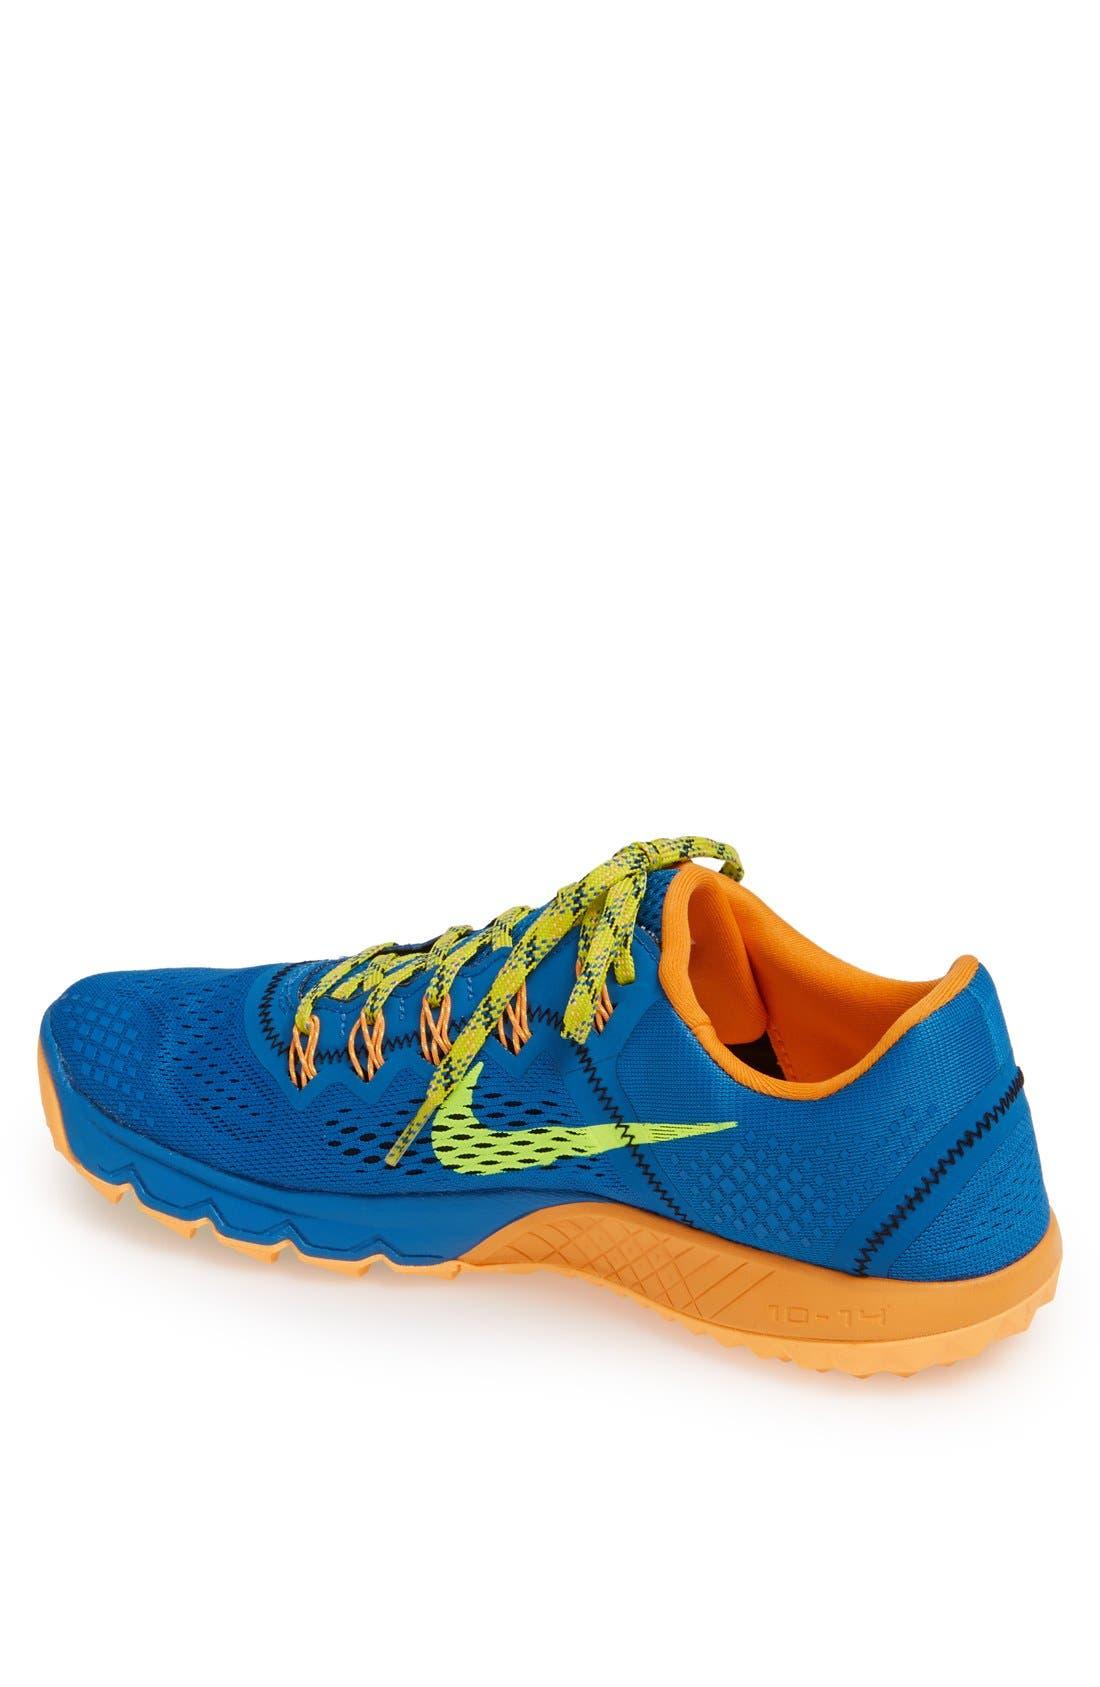 Alternate Image 2  - Nike 'Zoom Terra Kiger' Trail Running Shoe (Men)